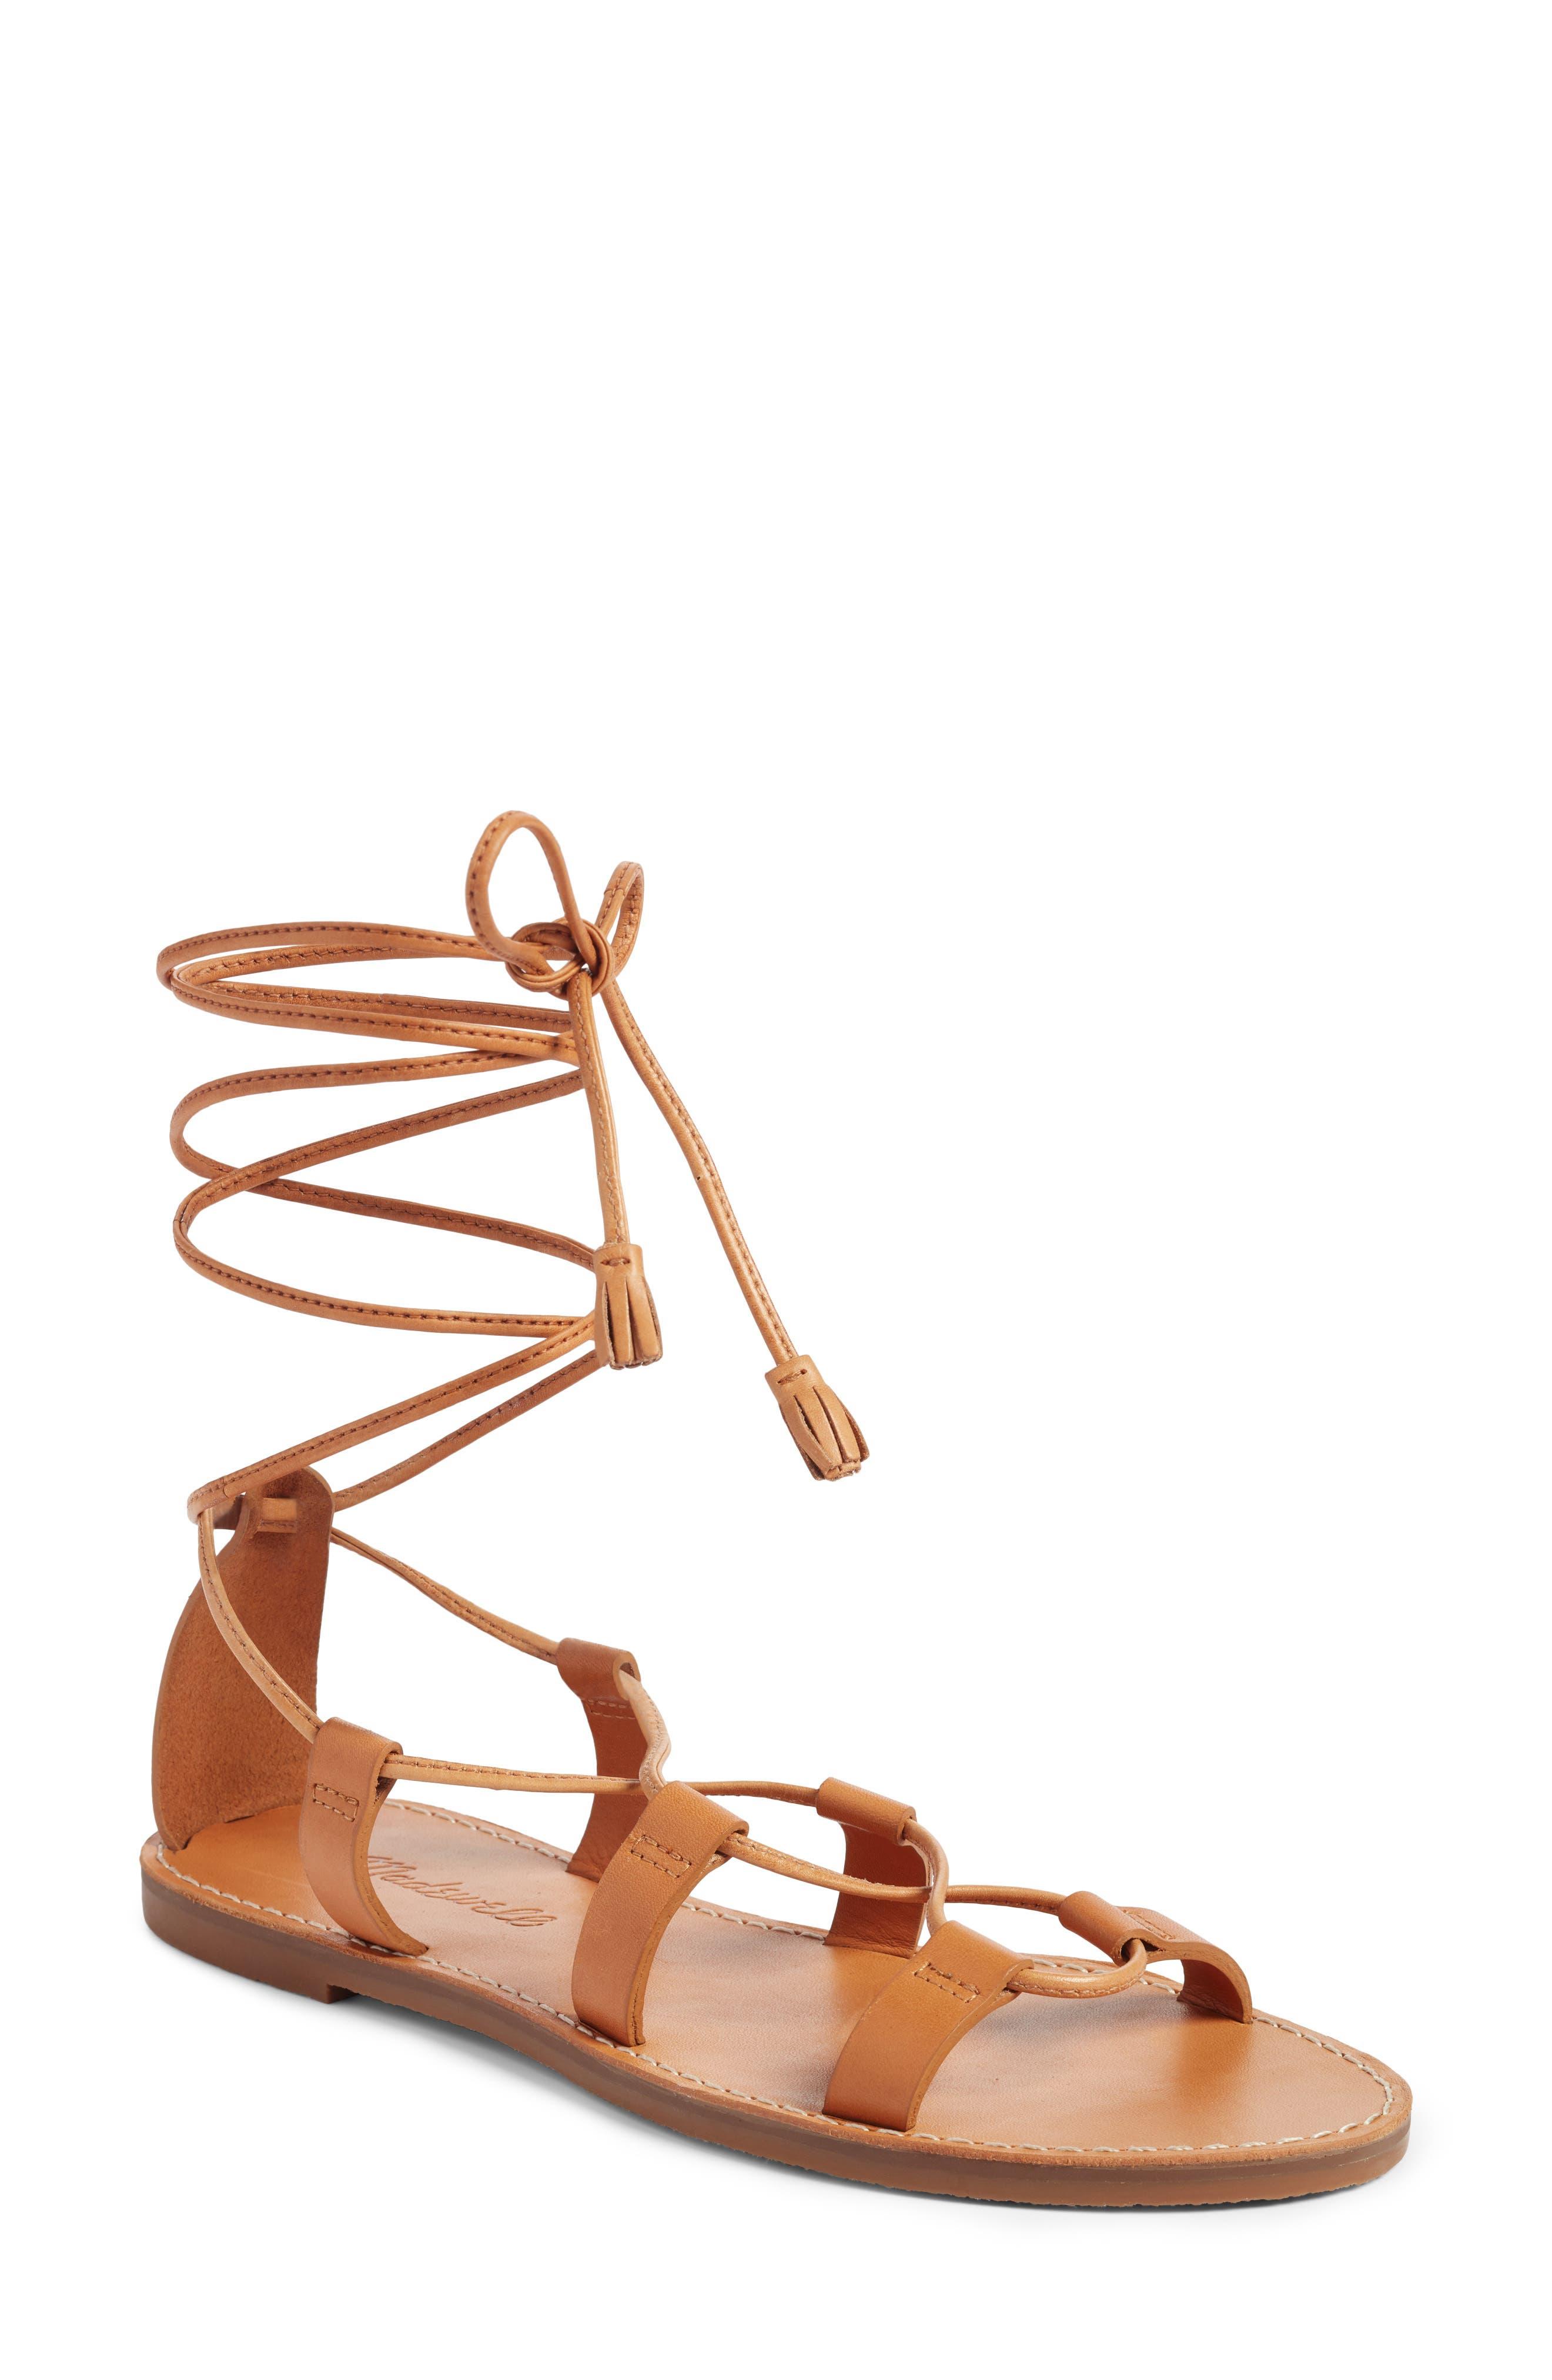 The Boardwalk Lace-Up Sandal,                             Main thumbnail 1, color,                             DESERT CAMEL LEATHER